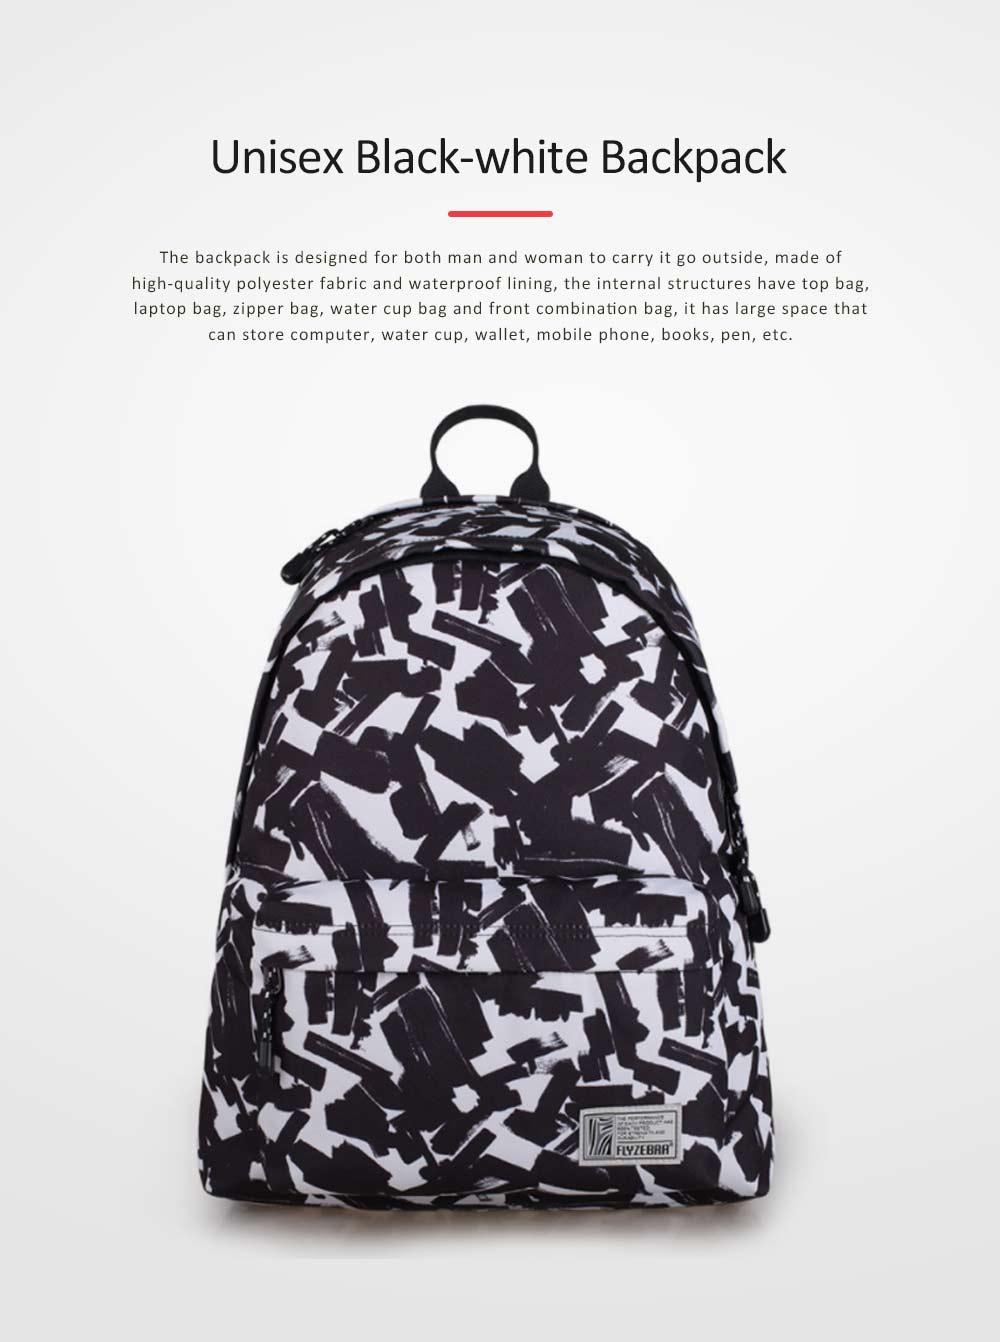 Unisex Black-white Backpack for Travel, Fashionable School Backpack for 14 inch Laptop 0